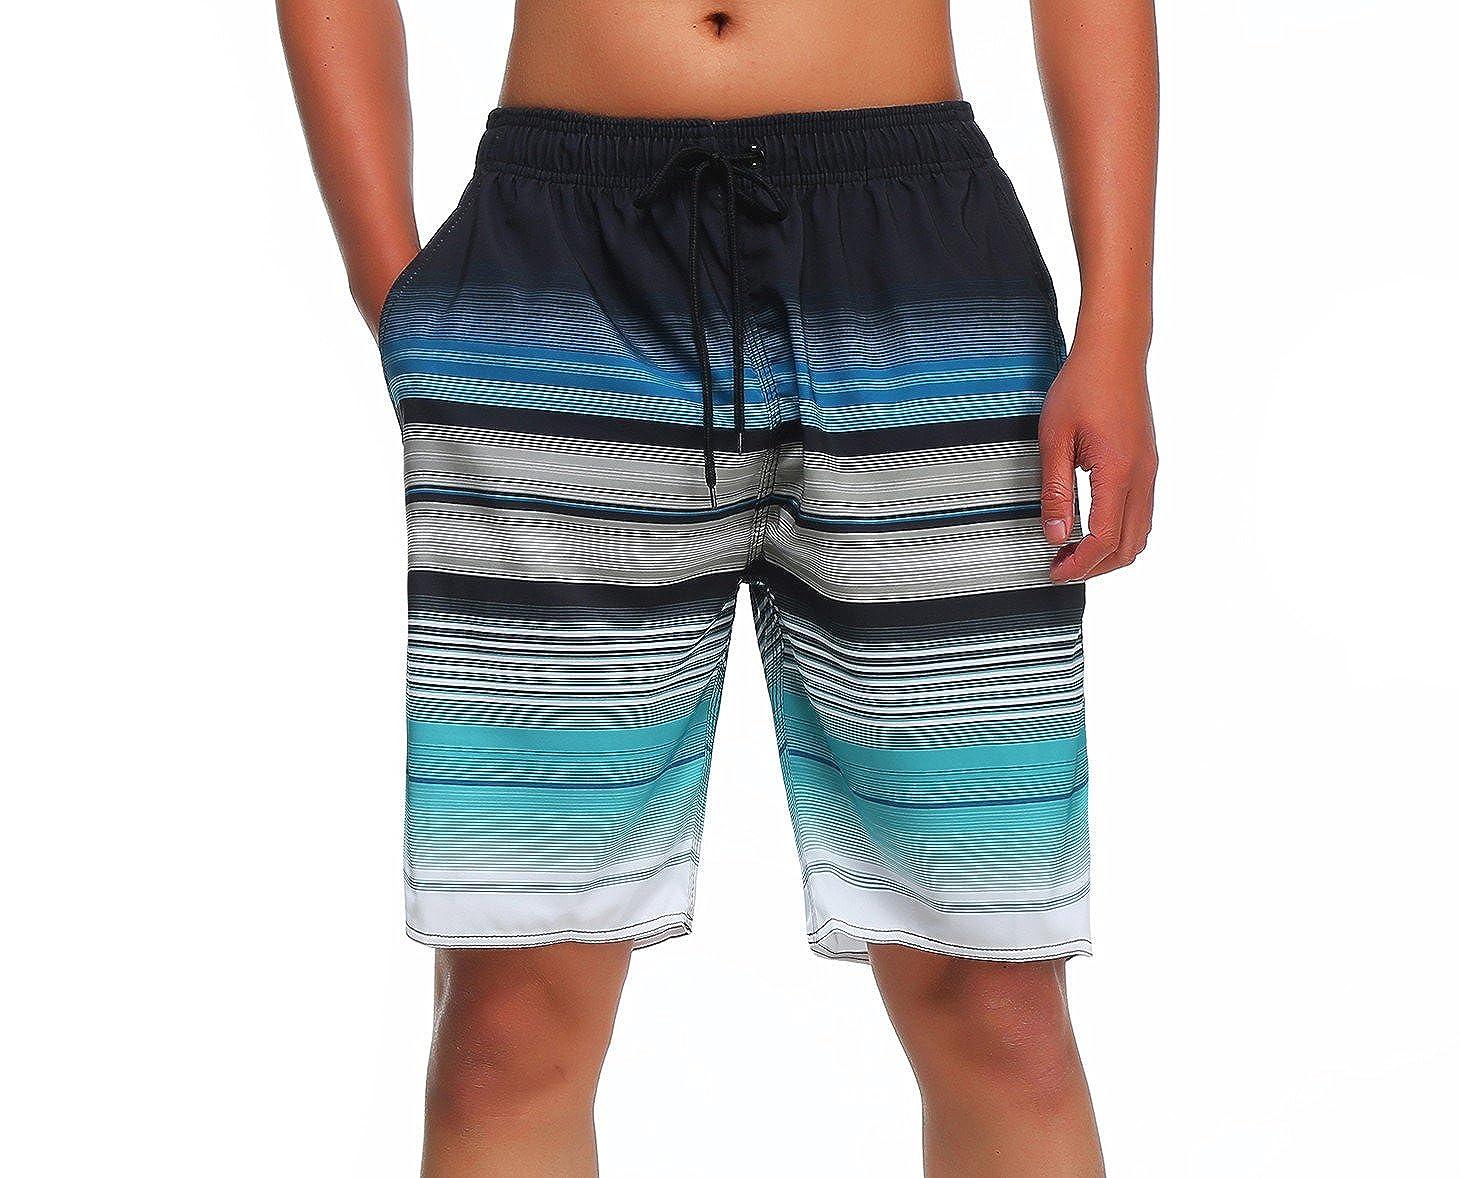 0027135b4f0 Amazon.com: Milankerr Men's Swim Trunks: Clothing